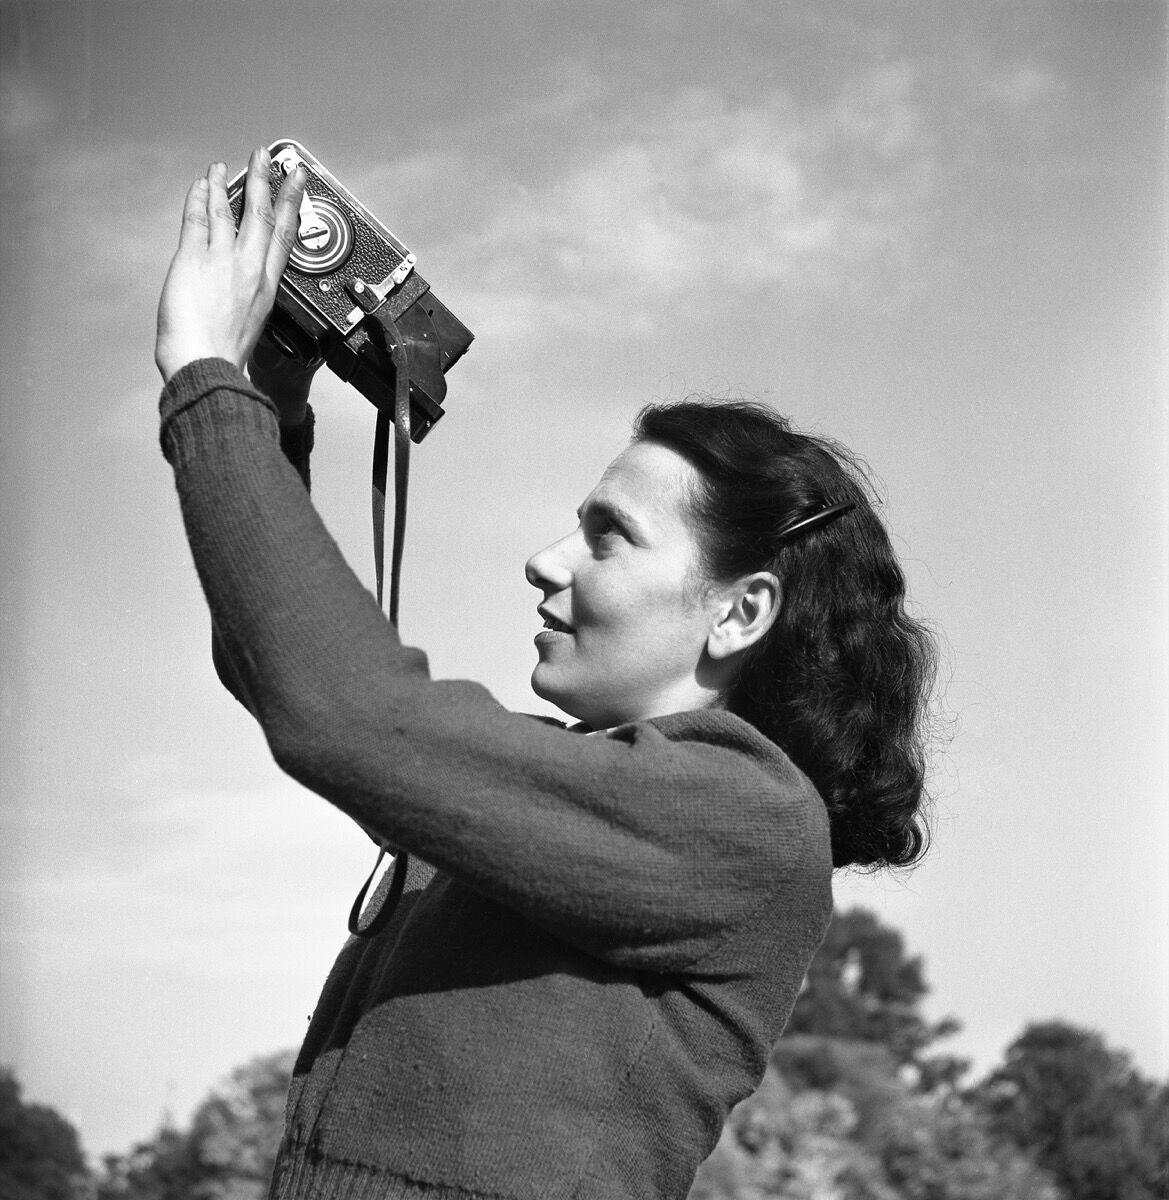 Henk Jonker, Maria Austria with camera, 1946. © Henk Jonker / MAI. Courtesy of the Jewish Historical Museum, Amsterdam.